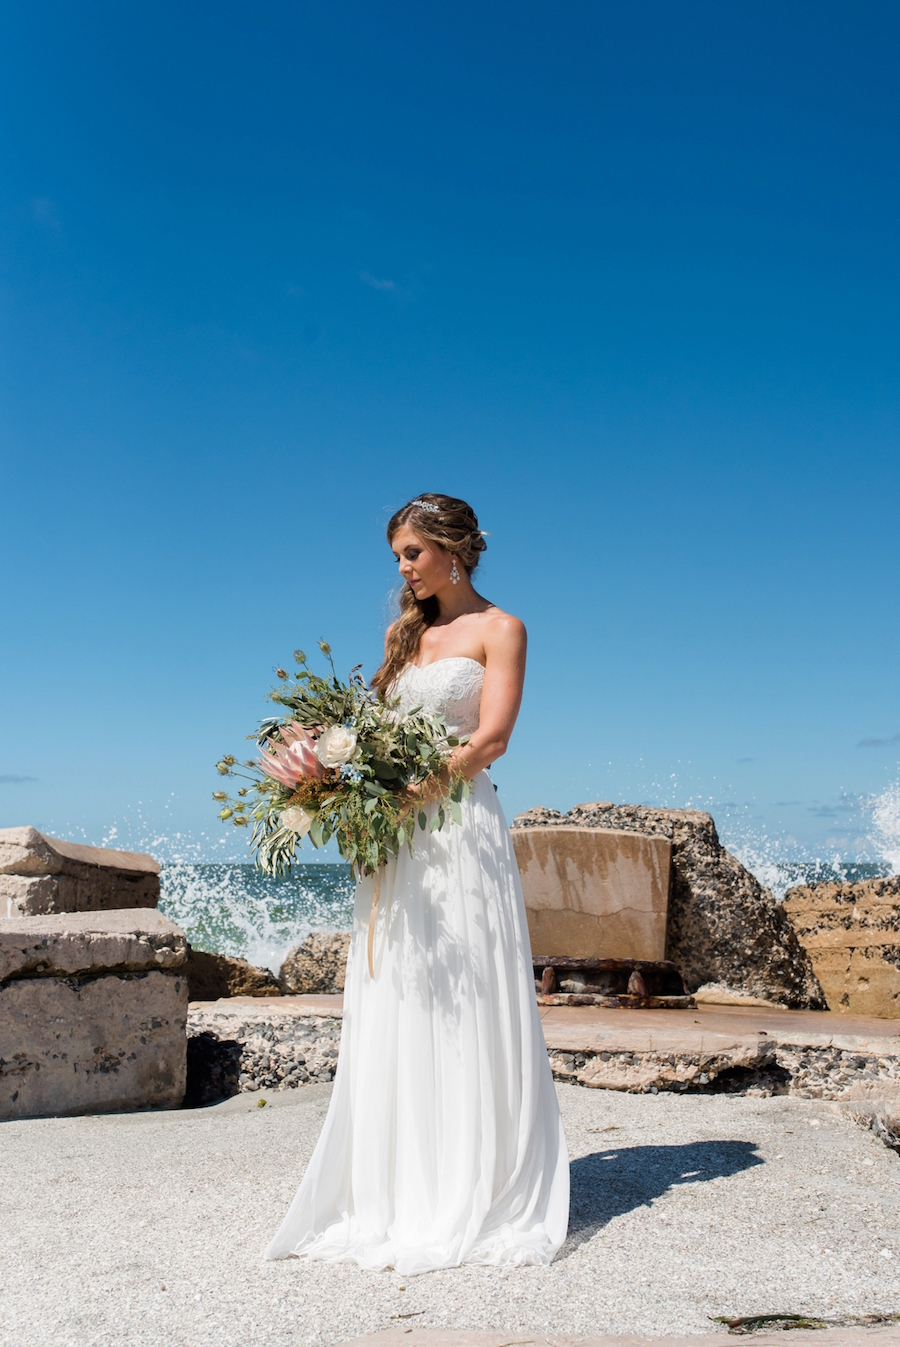 Coastal Beach Bridal Wedding Portrait in Strapless Chiffon Dessy Wedding Dress| Tampa Bay Wedding Photographer, Caroline & Evan Photography